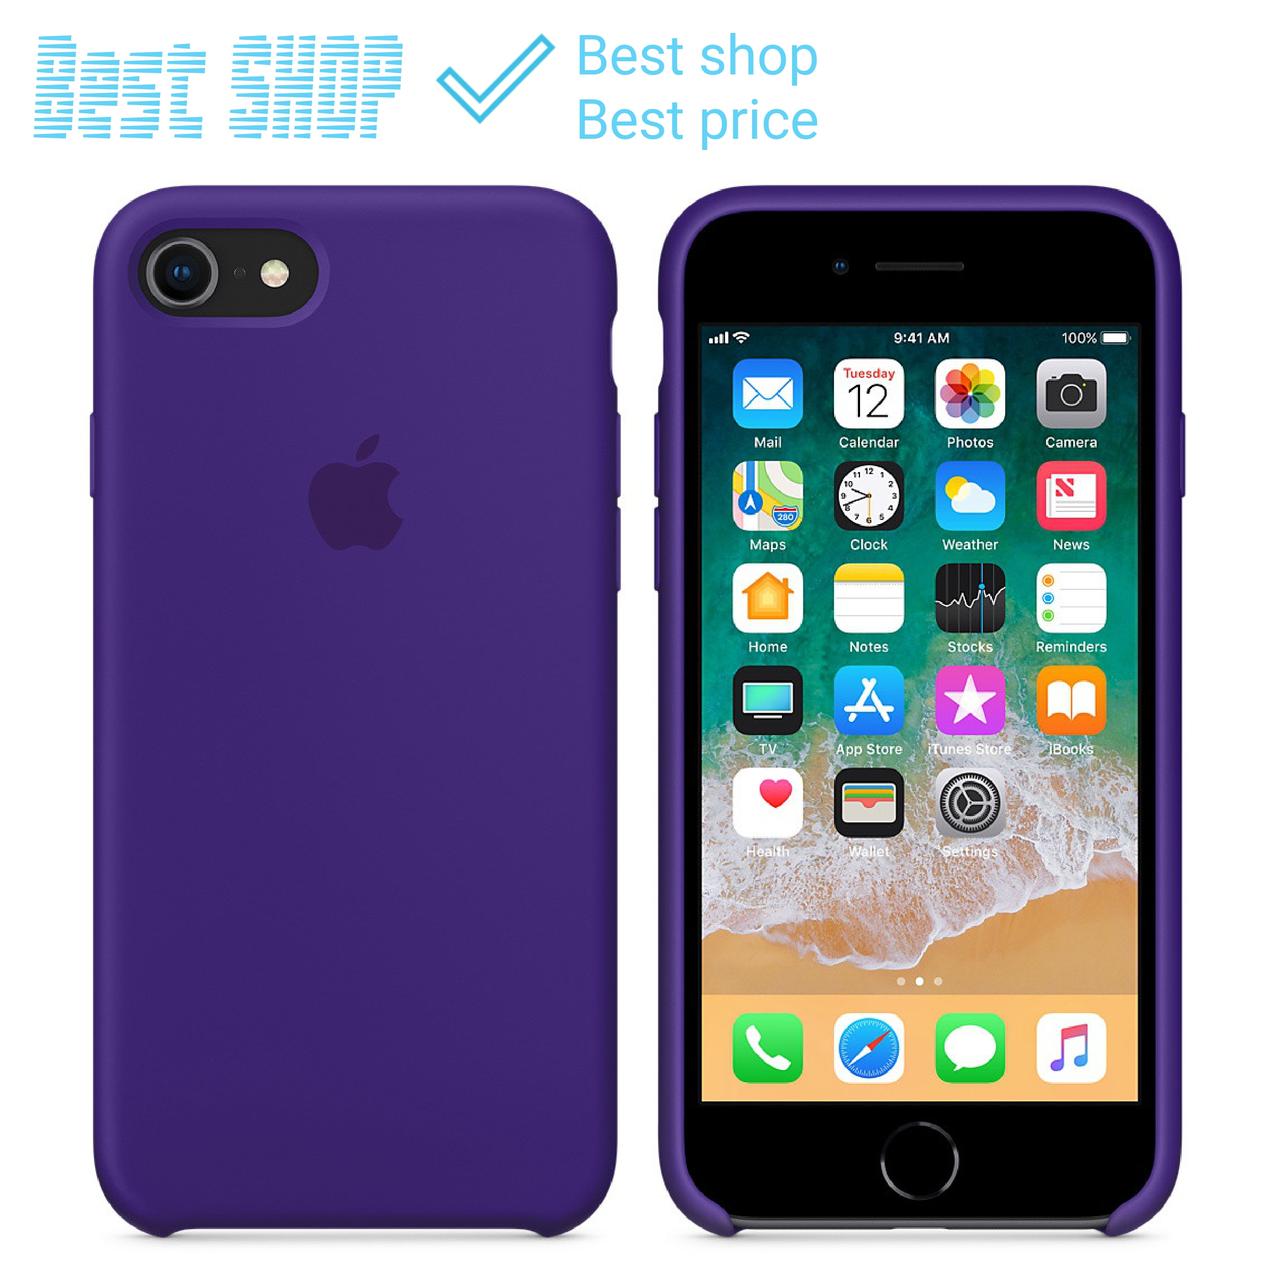 29 цветов Силиконовый чехол Apple Silicone Case для iPhone 6 Plus / 6s Plus